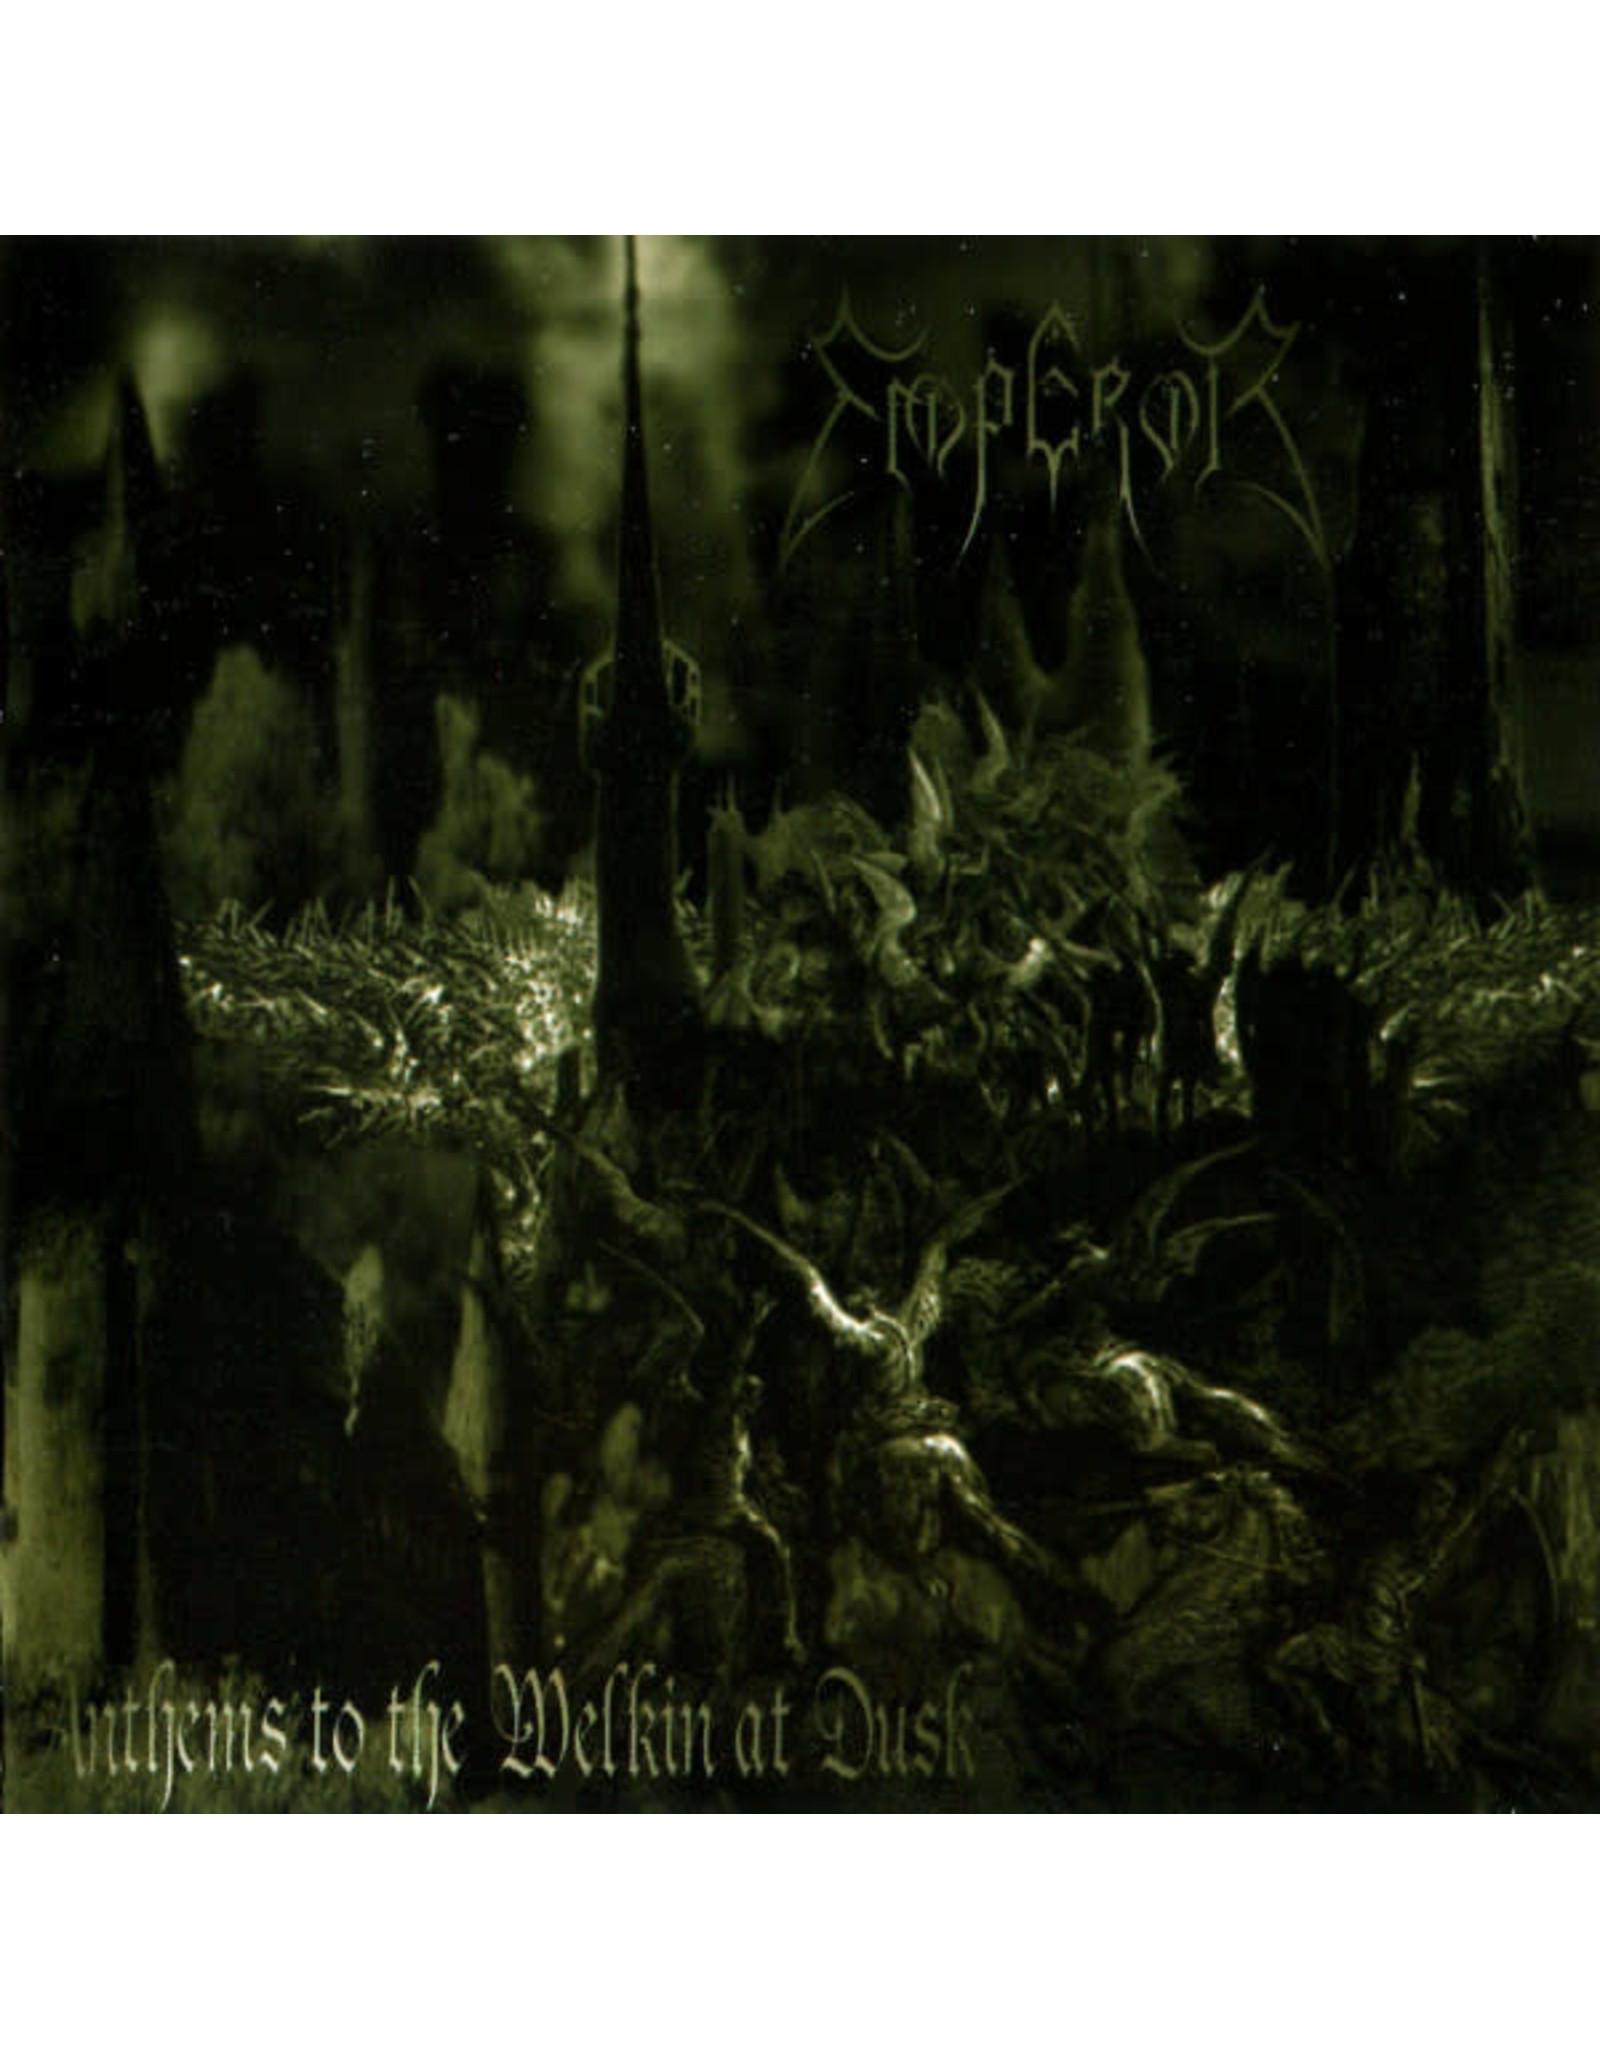 New Vinyl Emperor - Anthems To The Welkin At Dusk LP